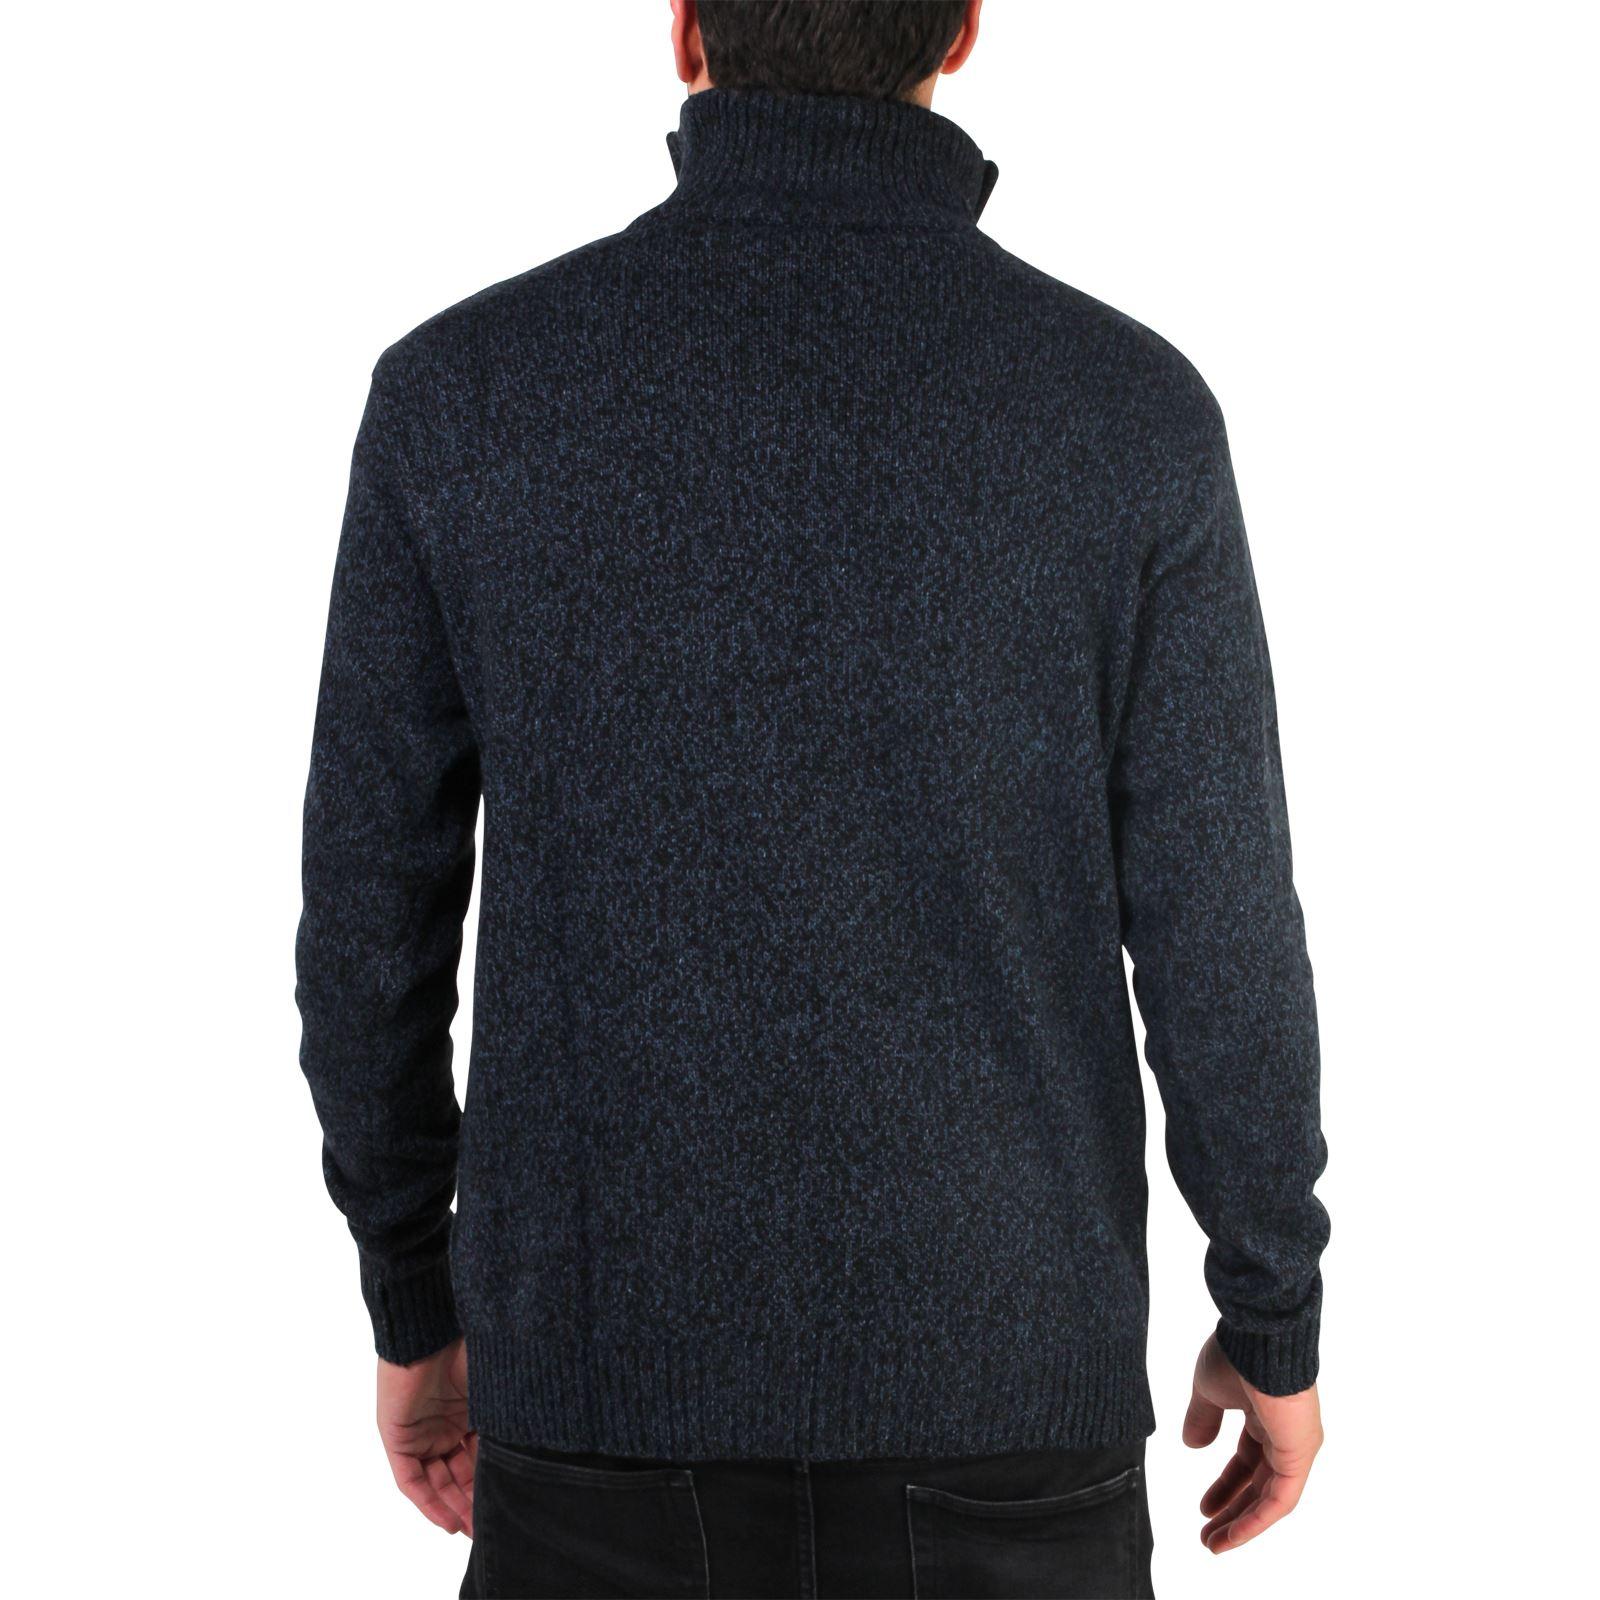 Mens-Soft-Wool-Knit-Half-Zip-Funnel-Neck-Jumper-Sweater-Top-Grandad-Pullover-Top thumbnail 9